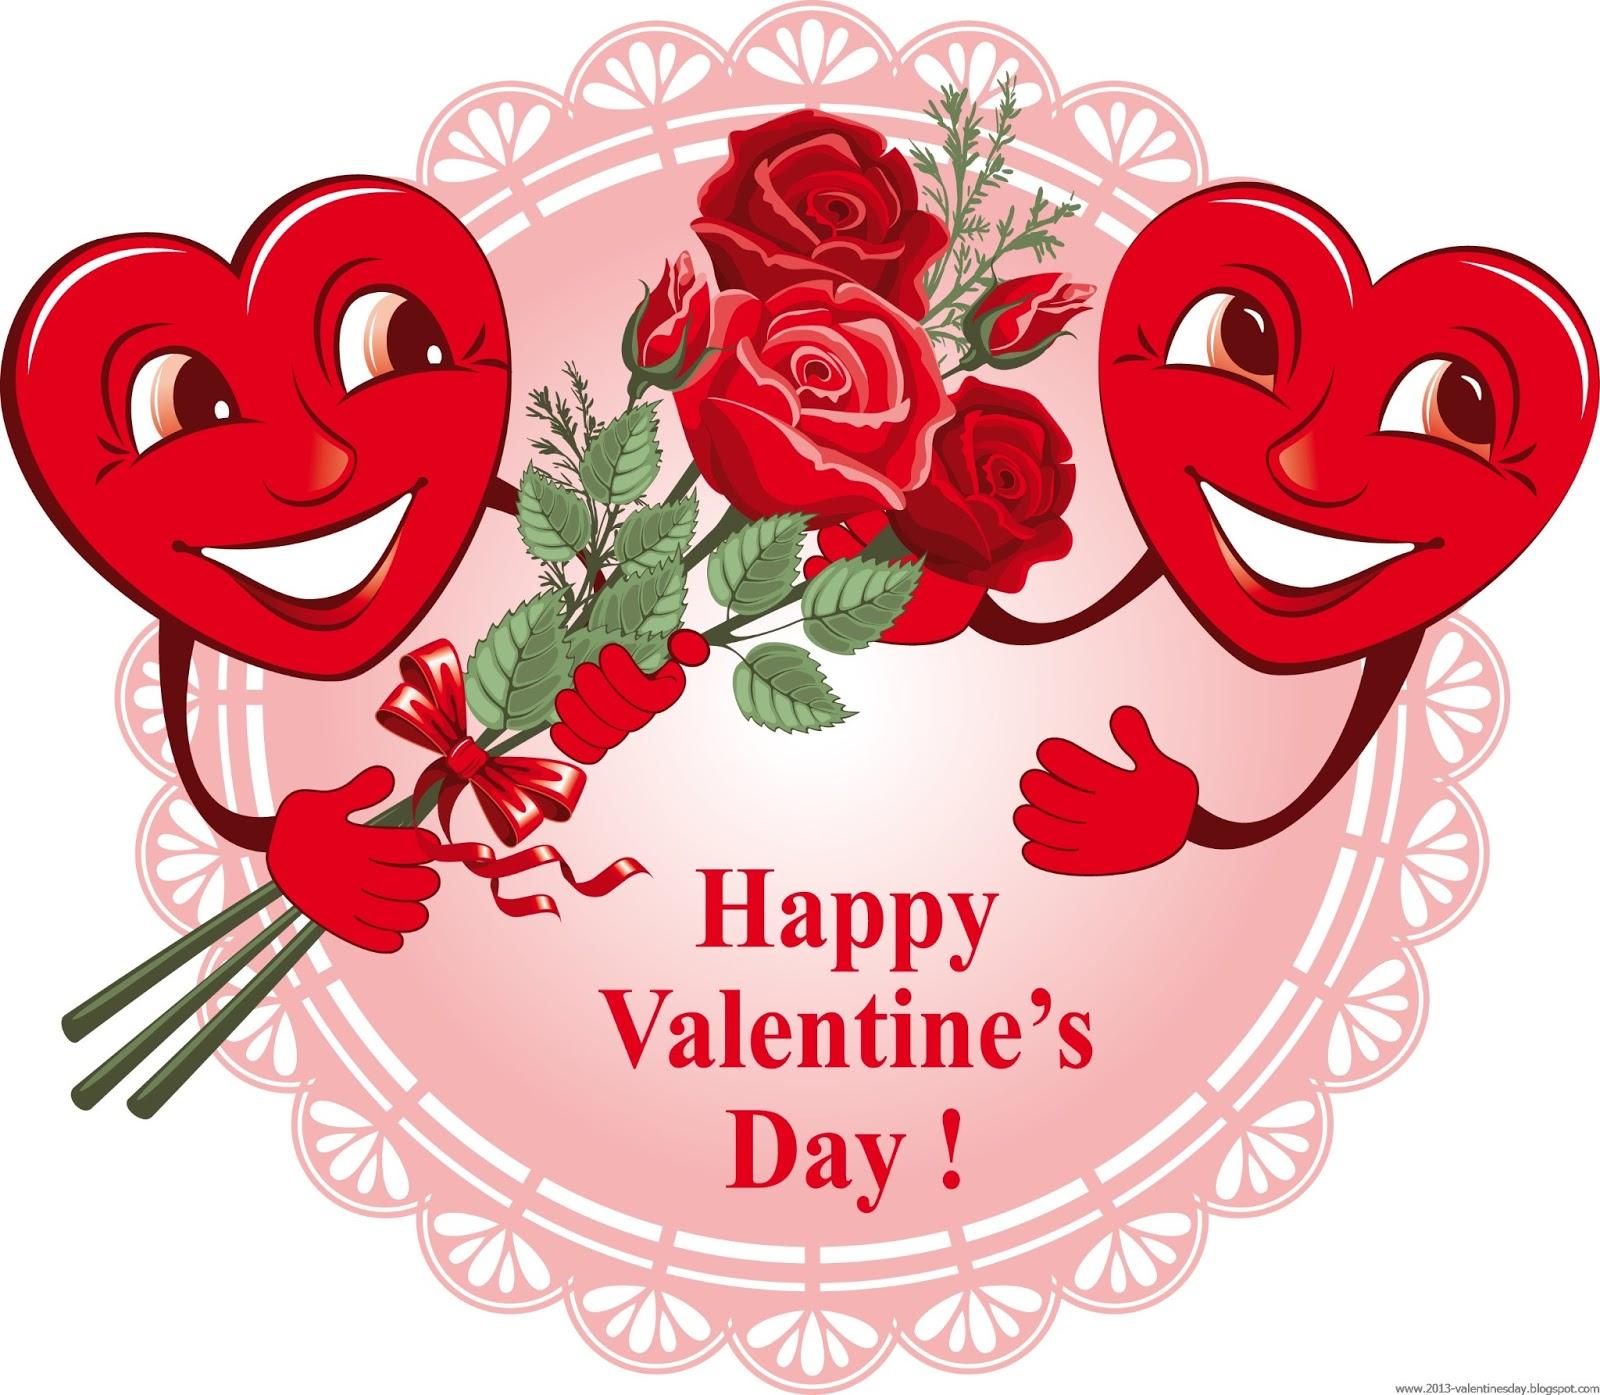 45+] Valentines Wallpaper Clip Art on WallpaperSafari.